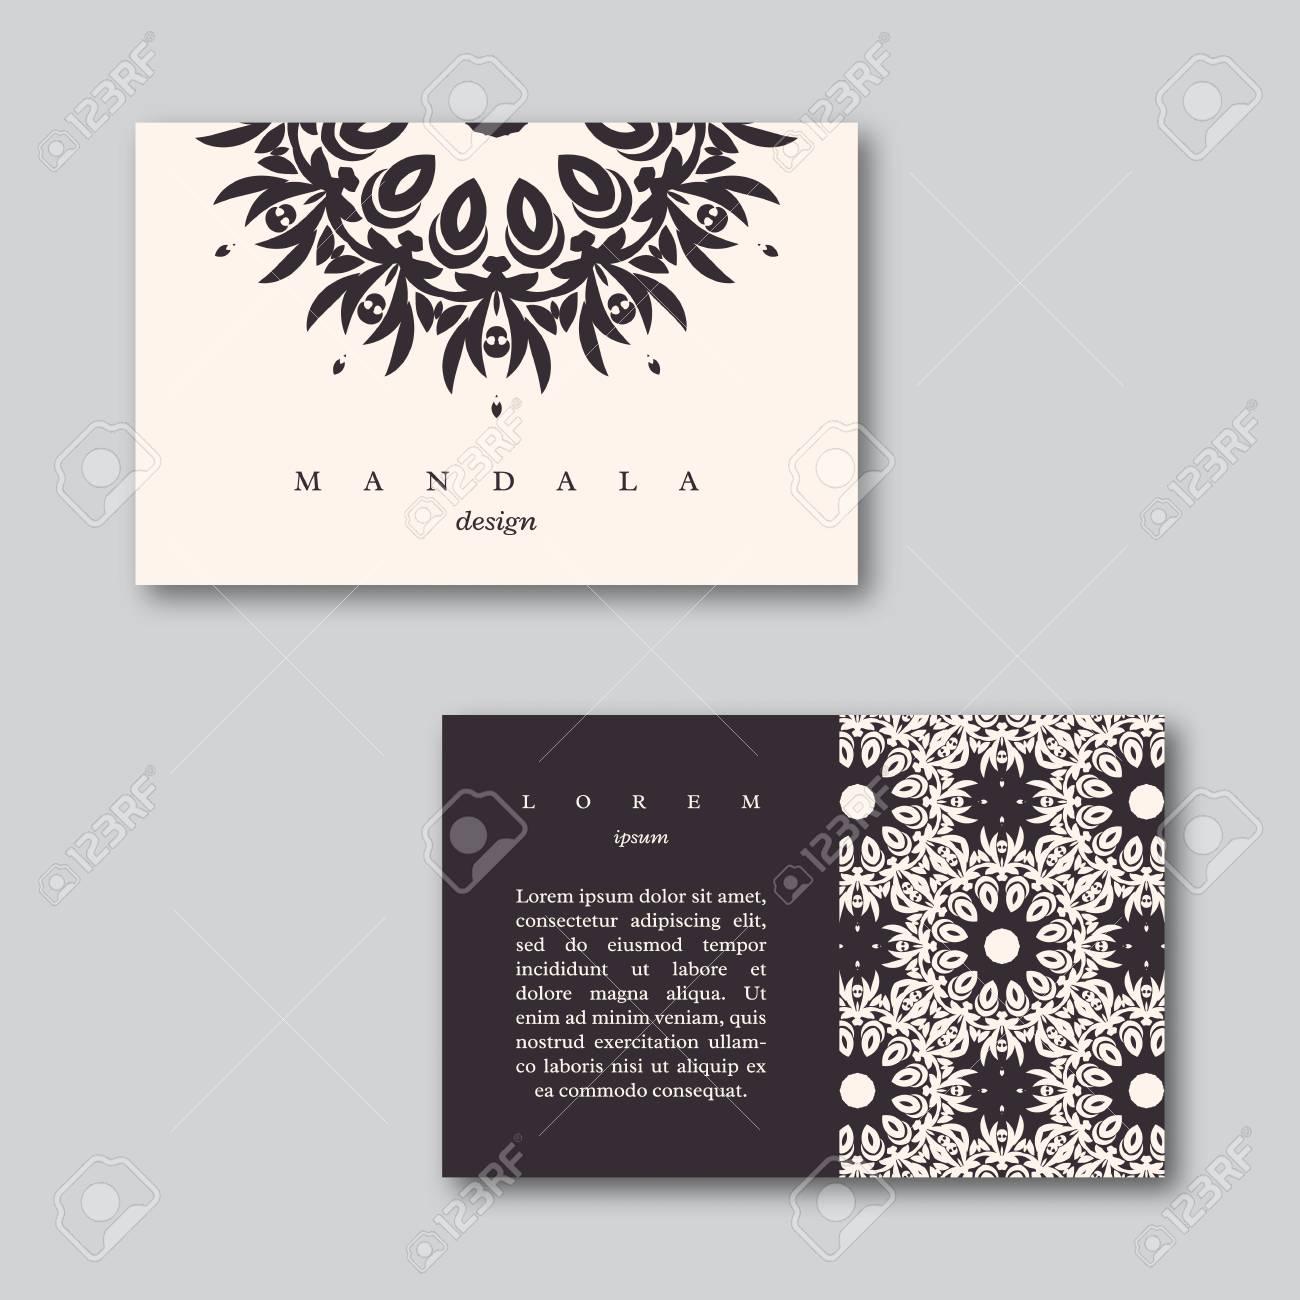 Jeu De Ornementaux Cartes Visite Avec Mandala Et Modele Carte